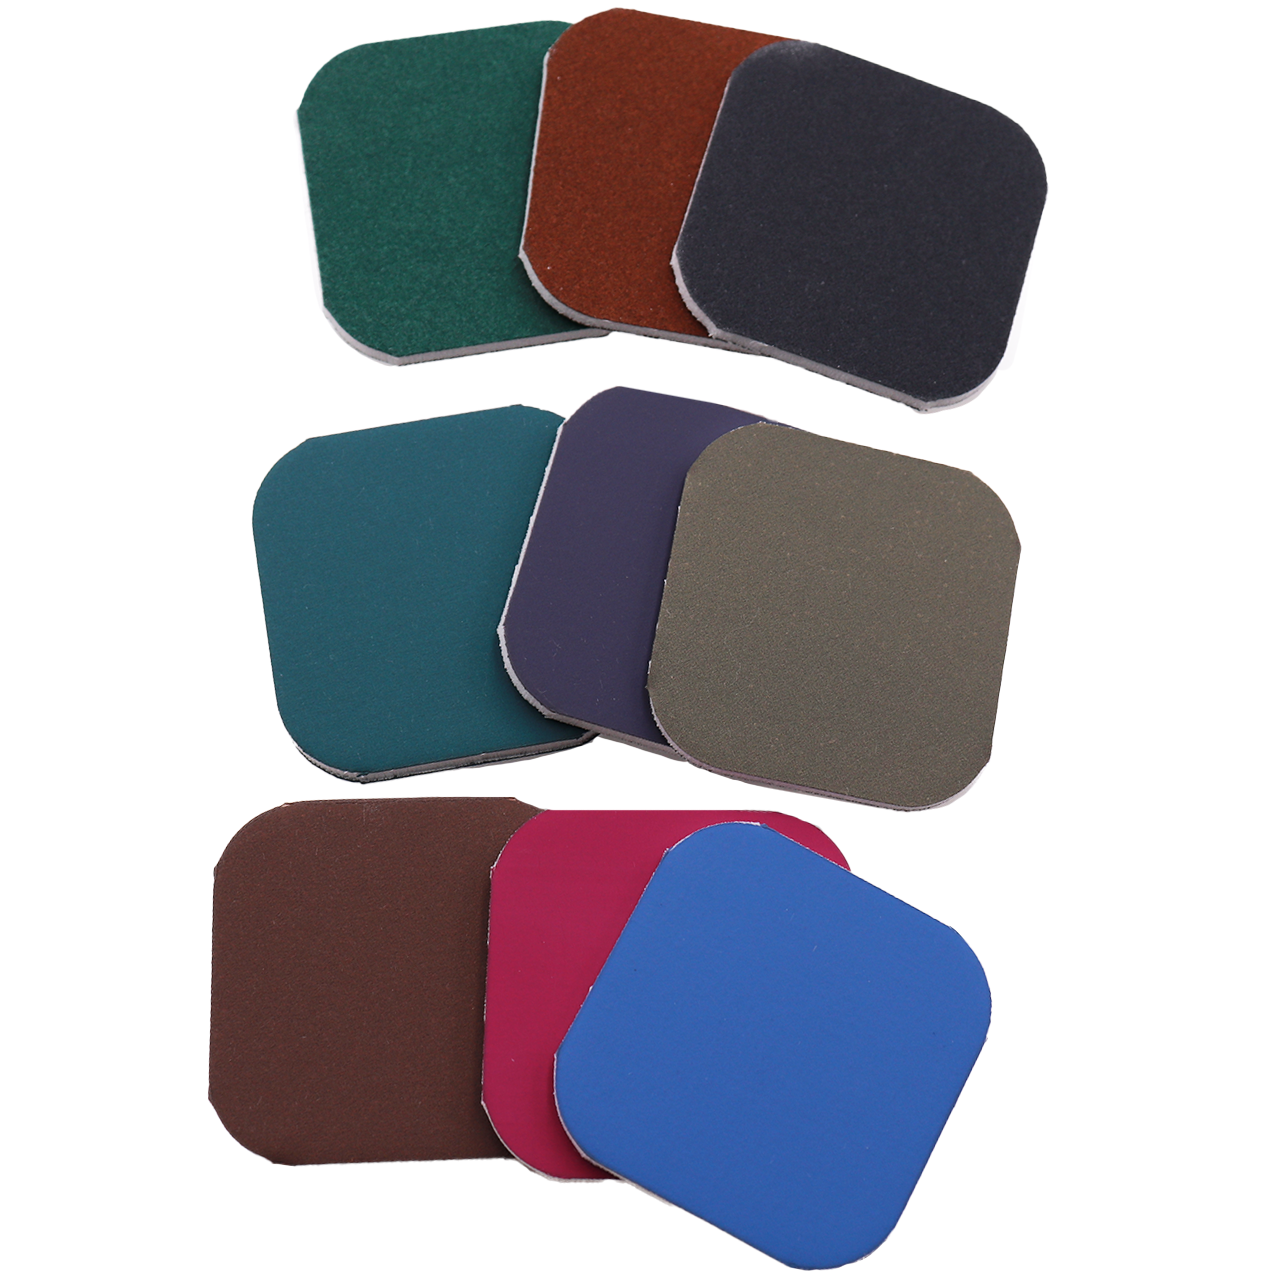 Micro-Mesh Soft Pad Variety Pack